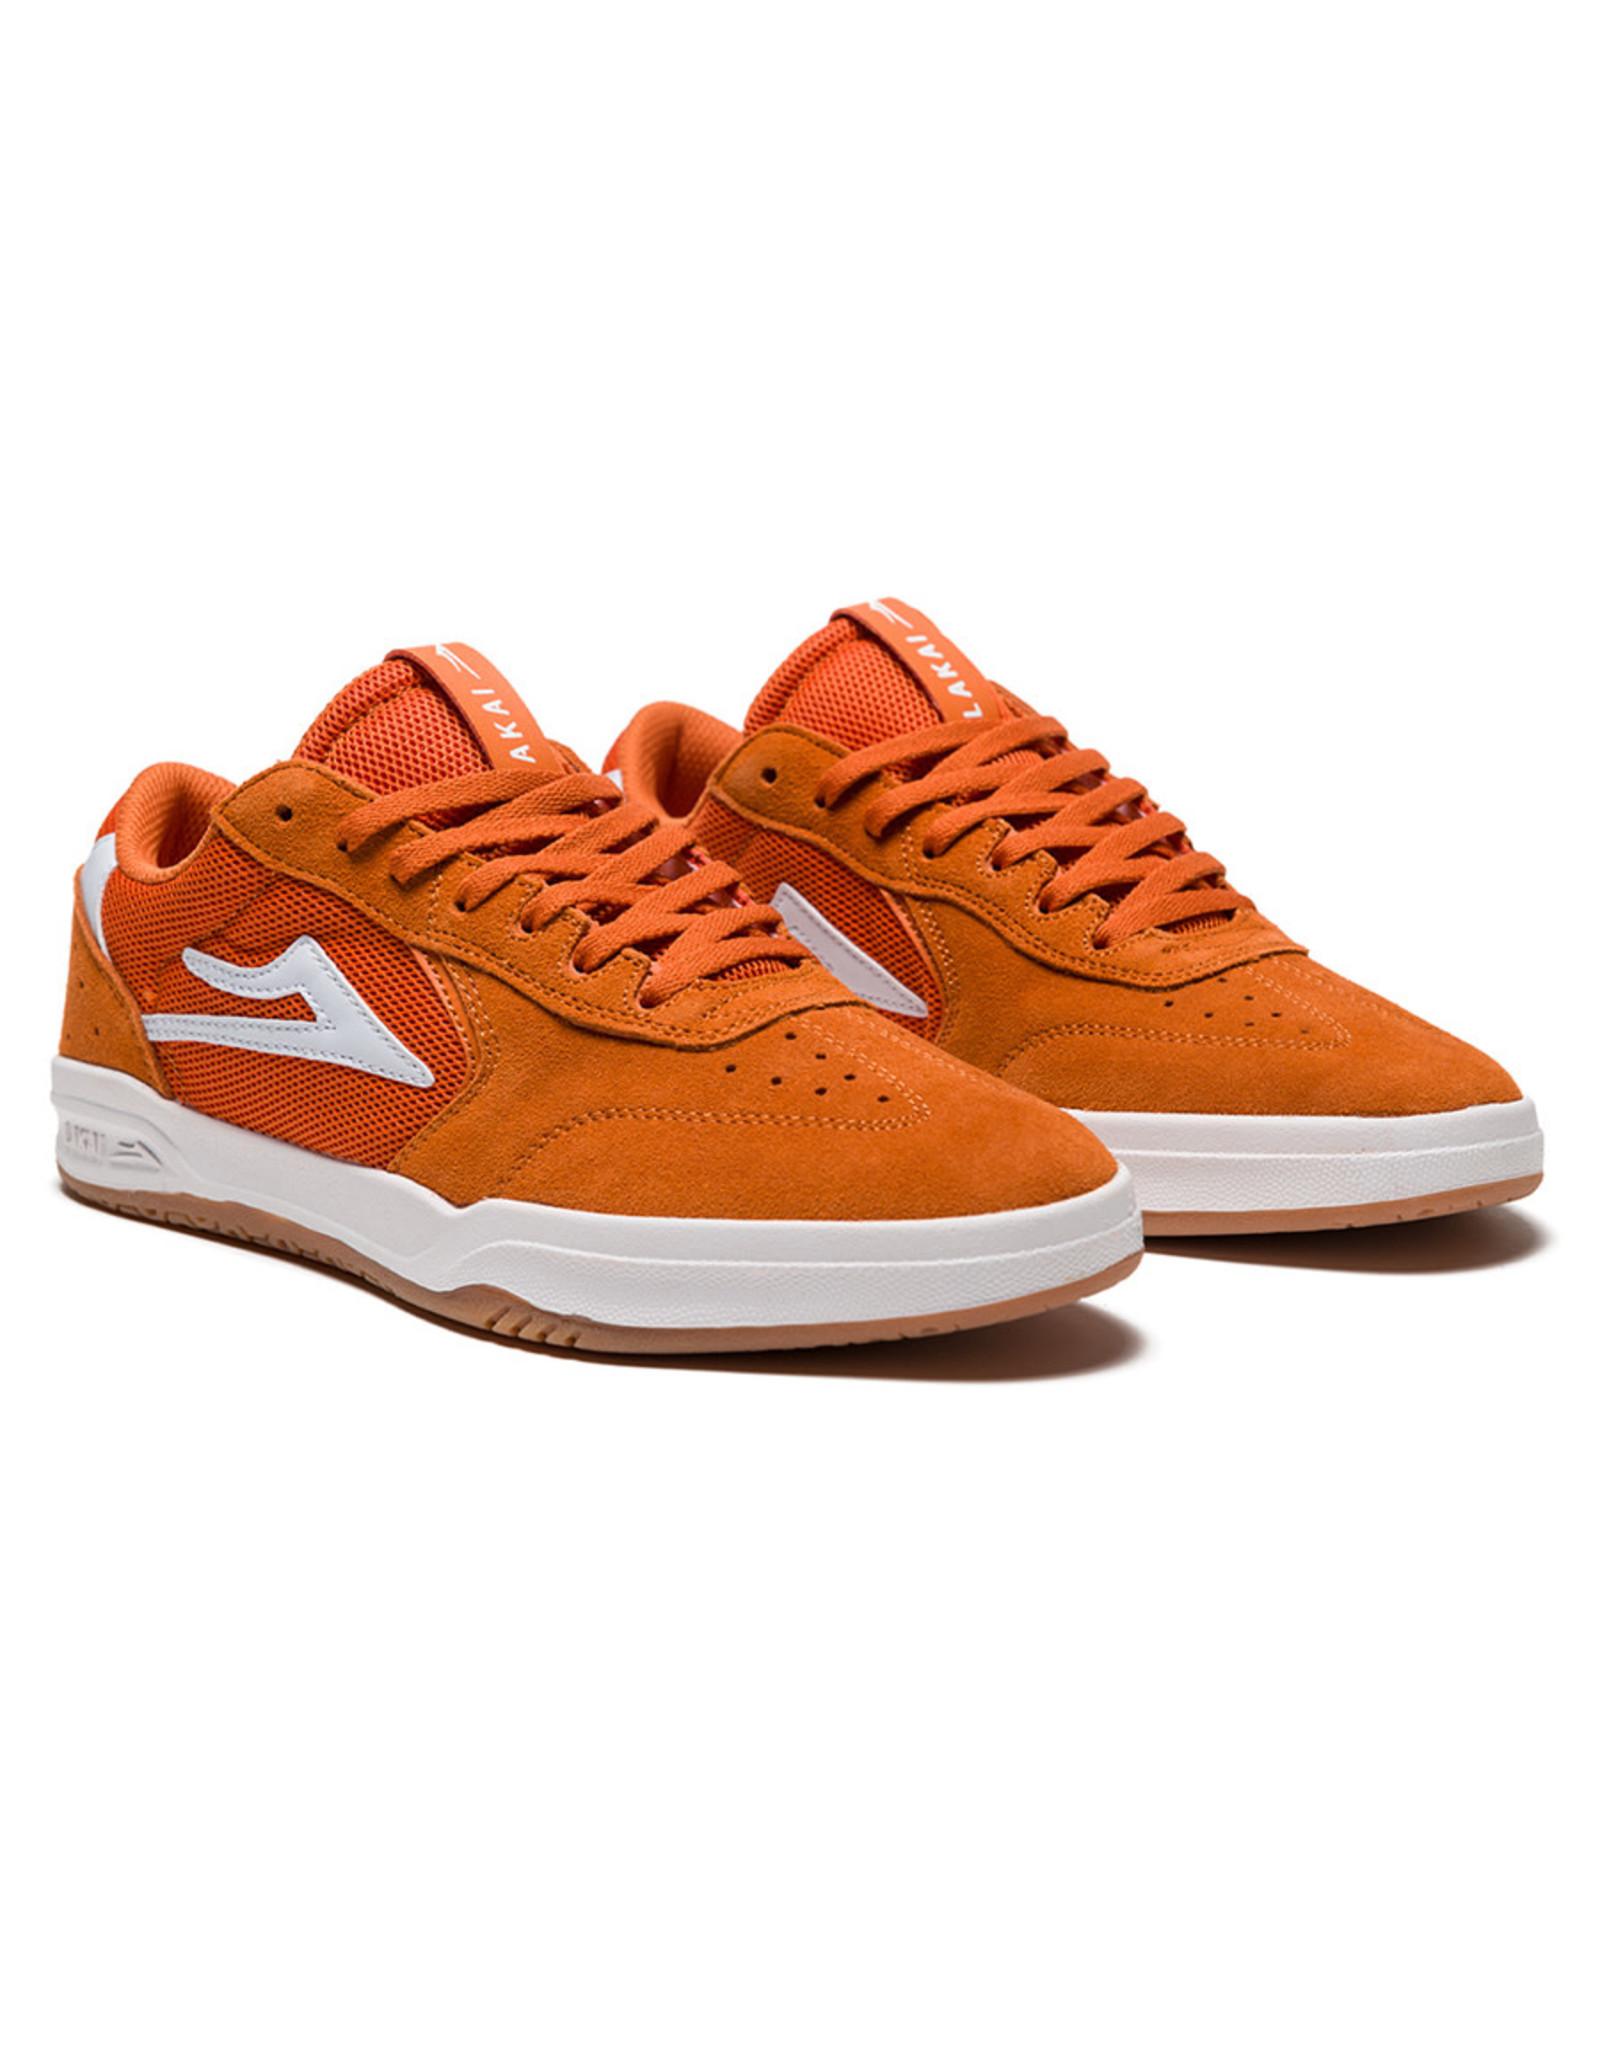 Lakai Shoes Lakai Shoe Atlantic (Burnt Orange Suede)